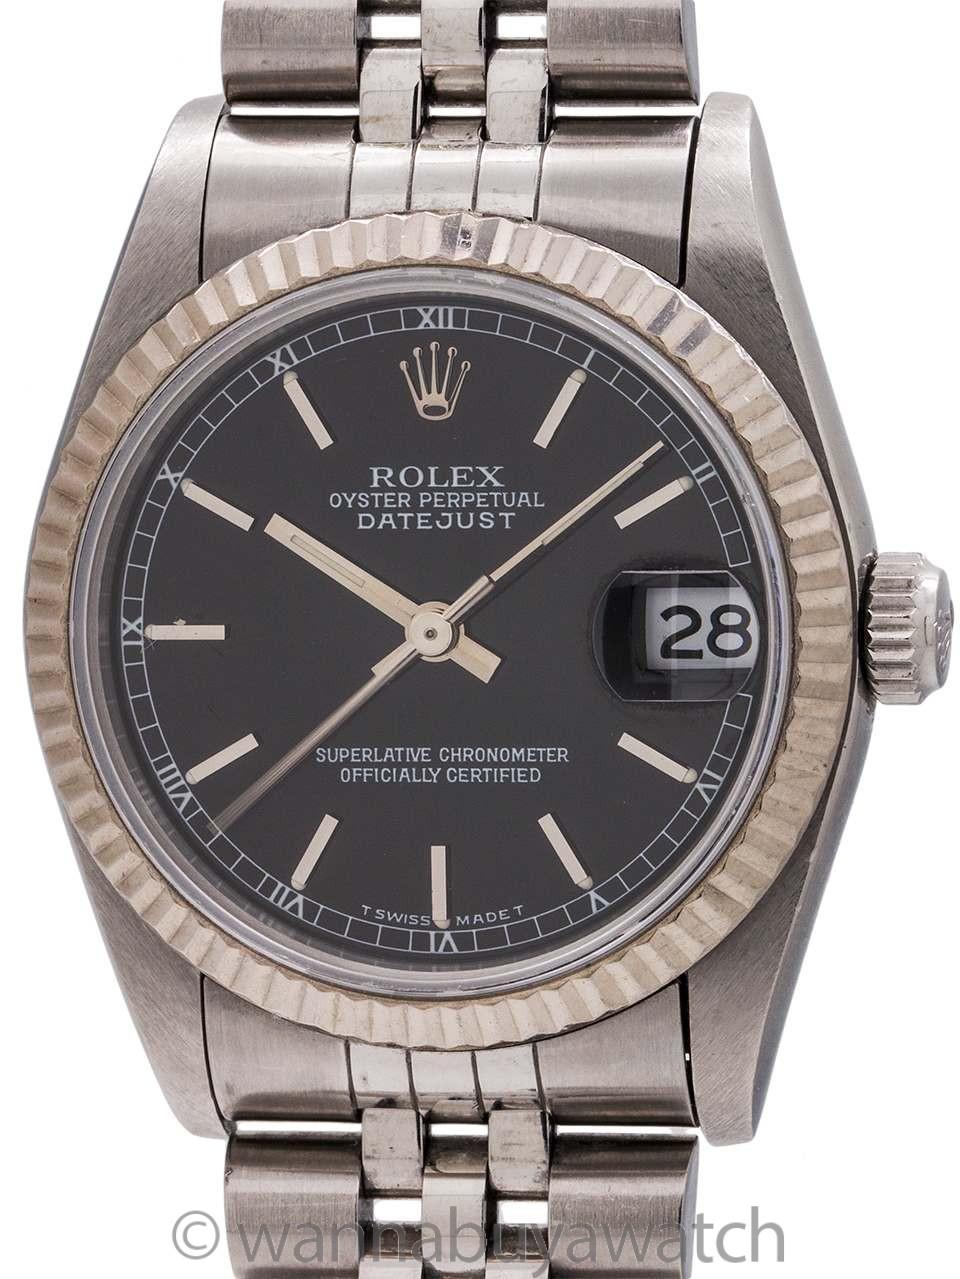 Rolex Midsize Datejust ref# 68274 SS/18K WG Black Dial circa 1993